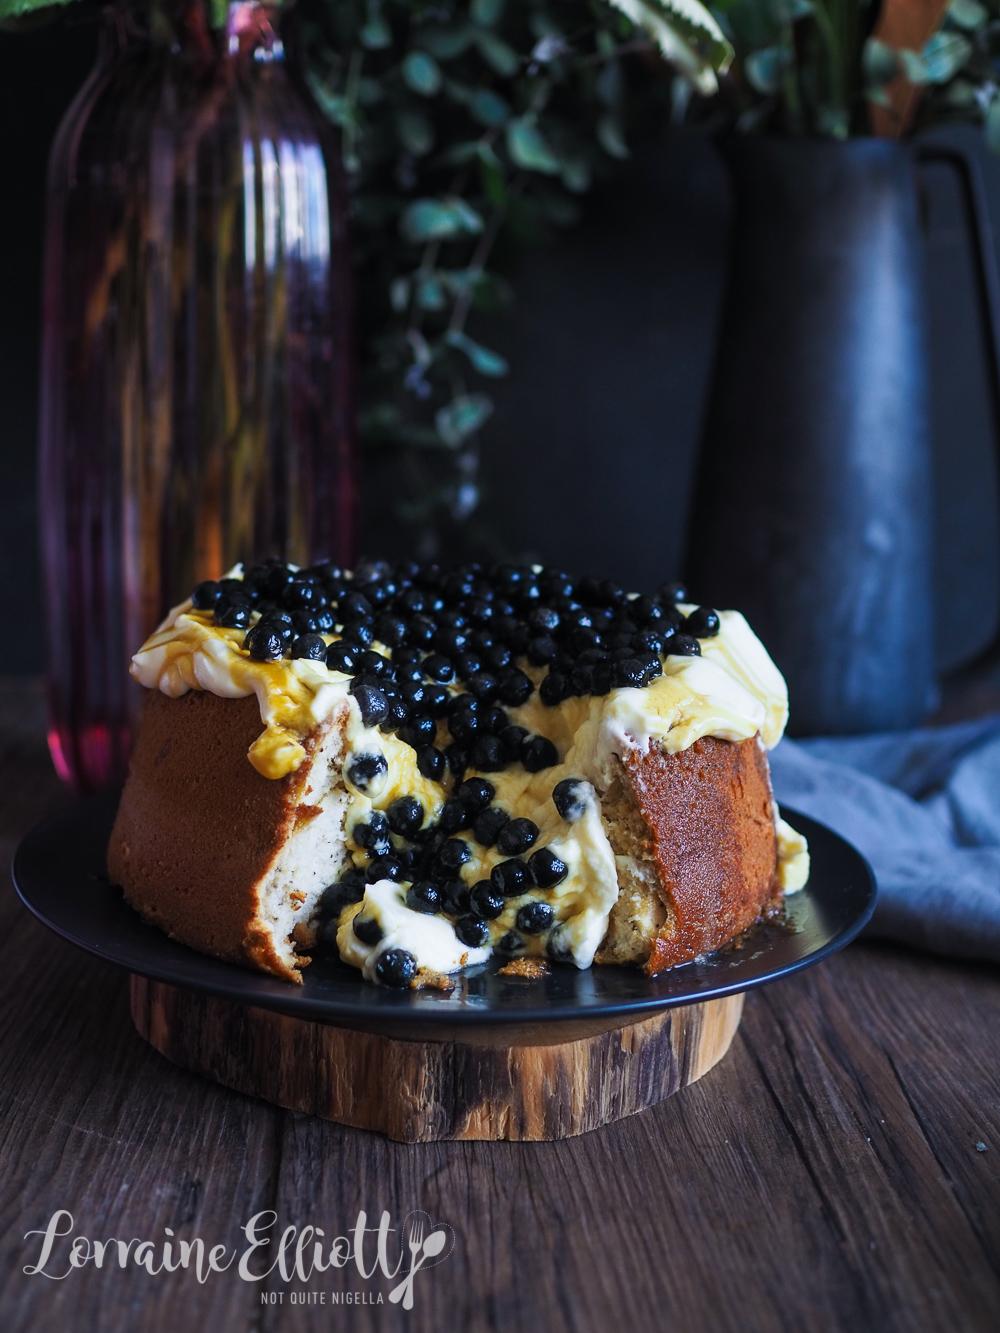 Bubble Tea Boba Chiffon Cake